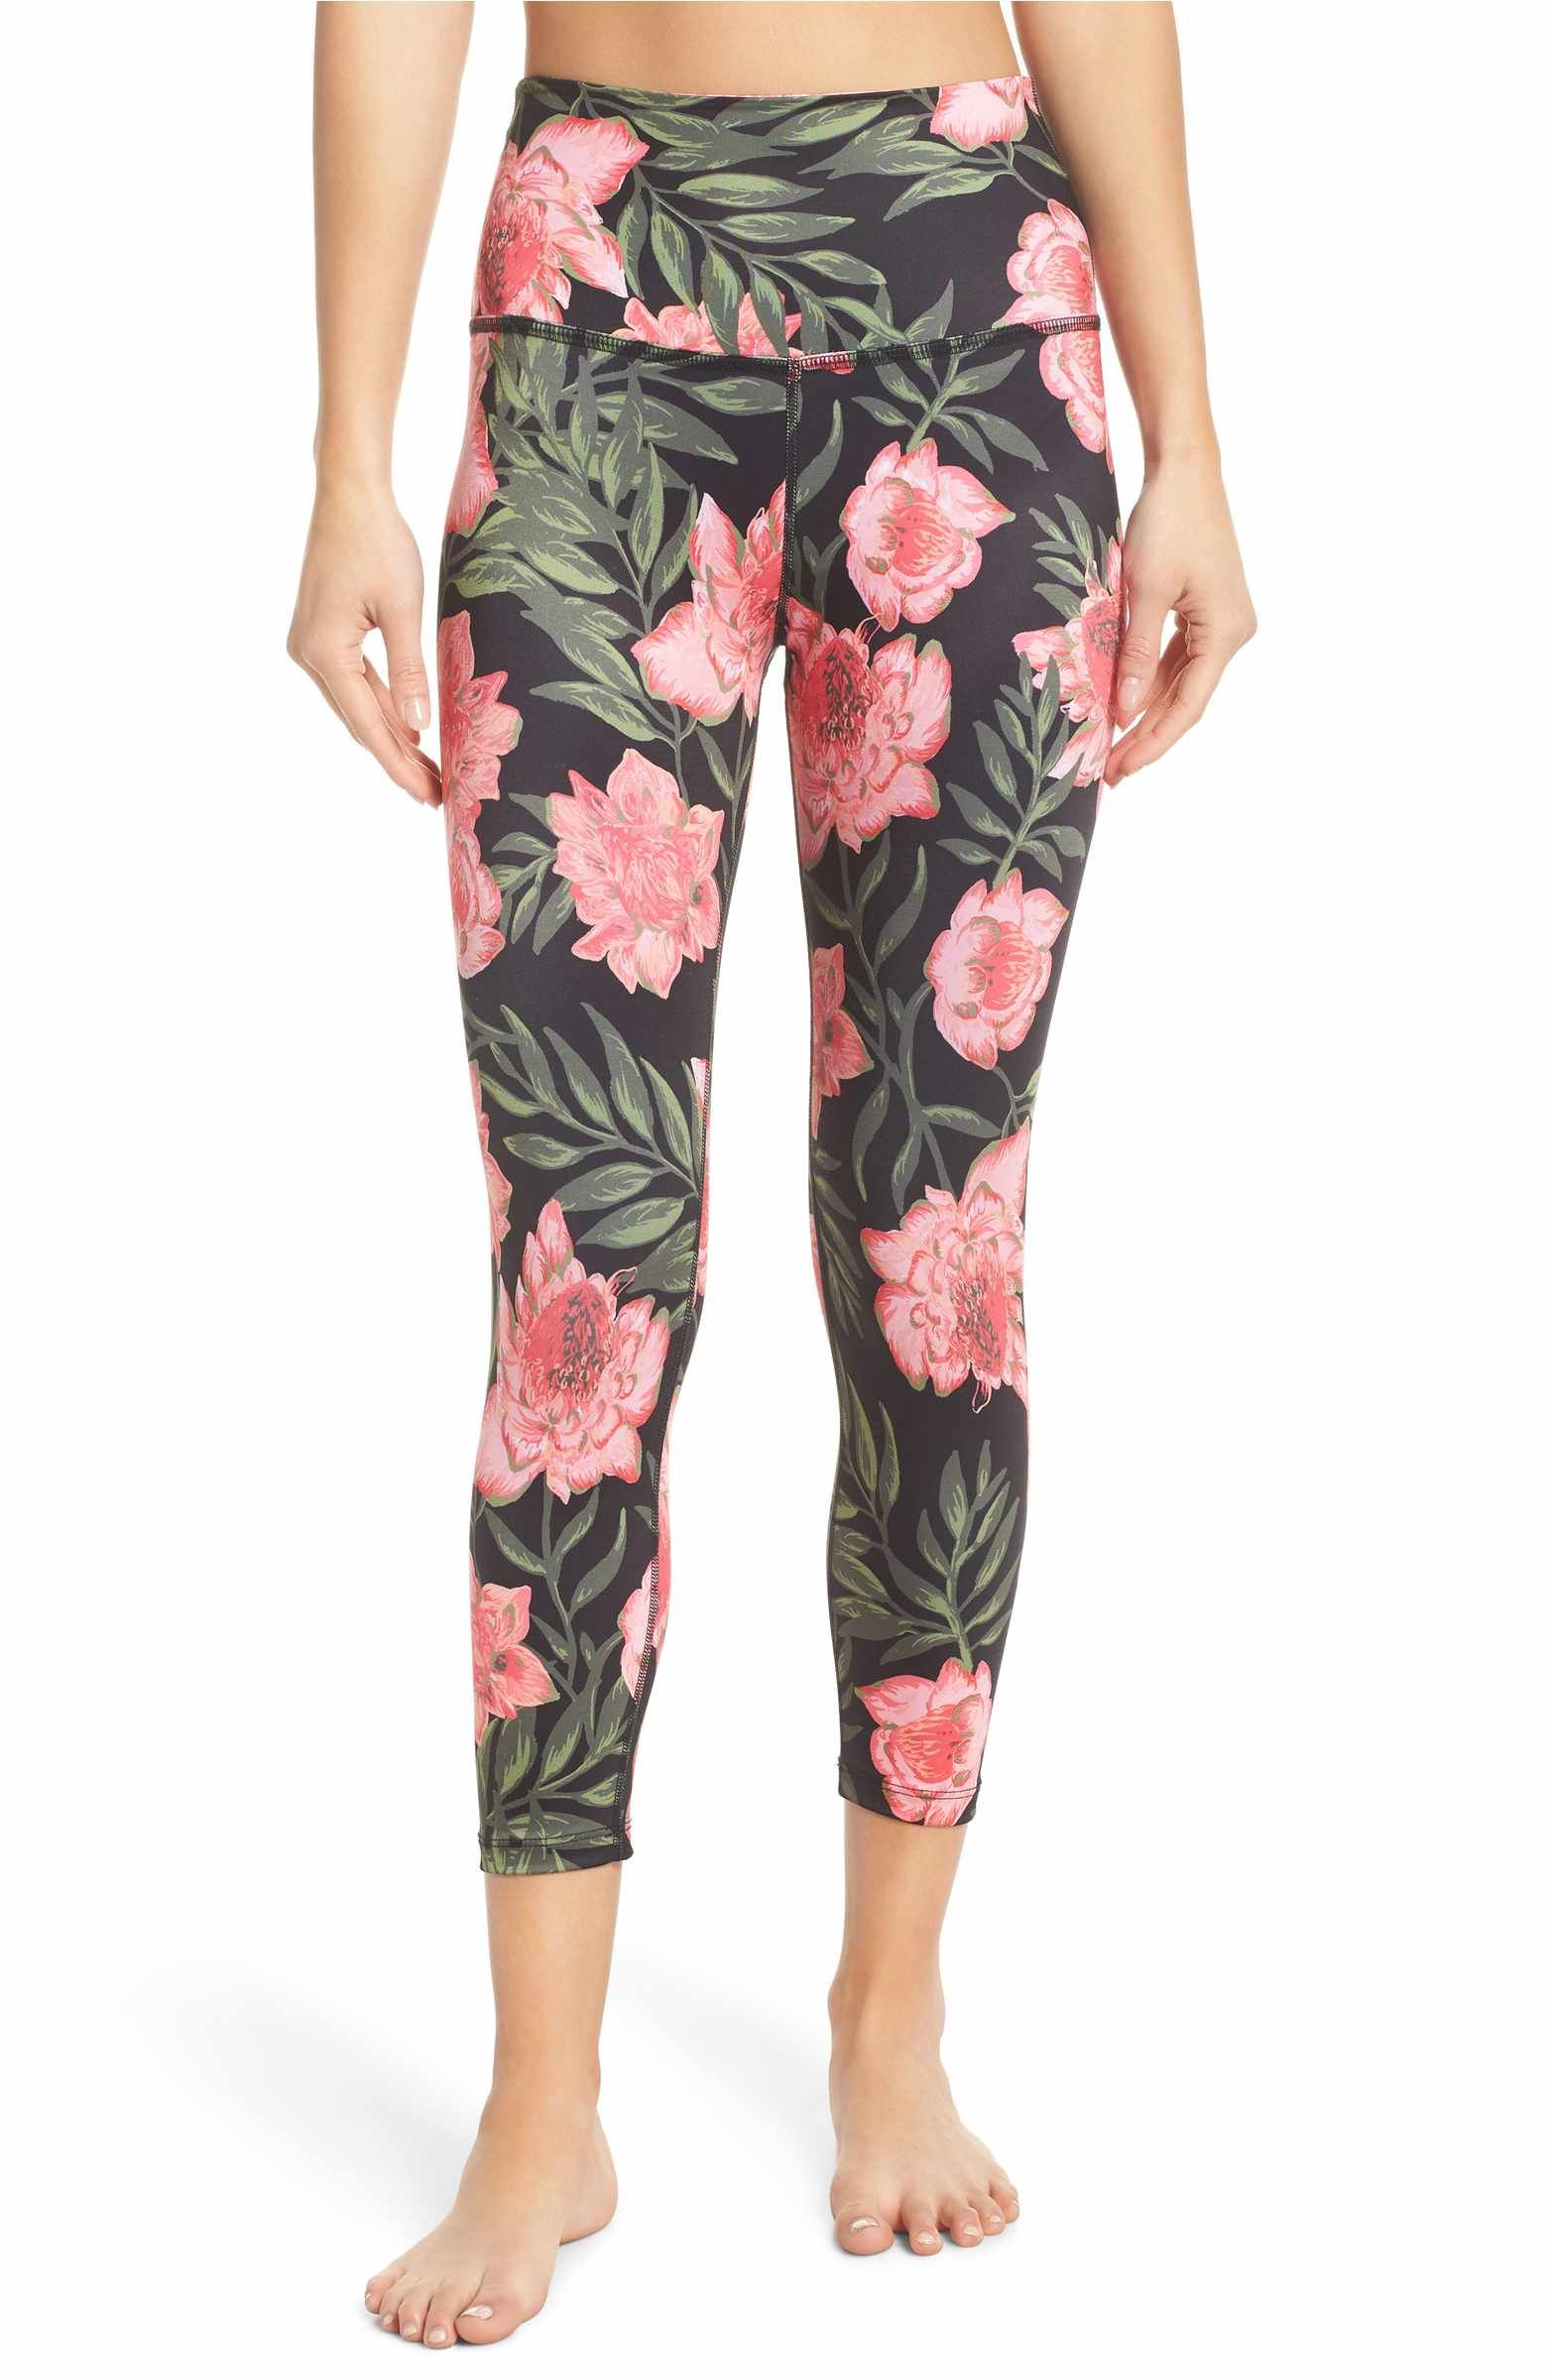 2eb037d82d Main Image - Beyond Yoga Lux Floral Print High Waist Capri Leggings ...